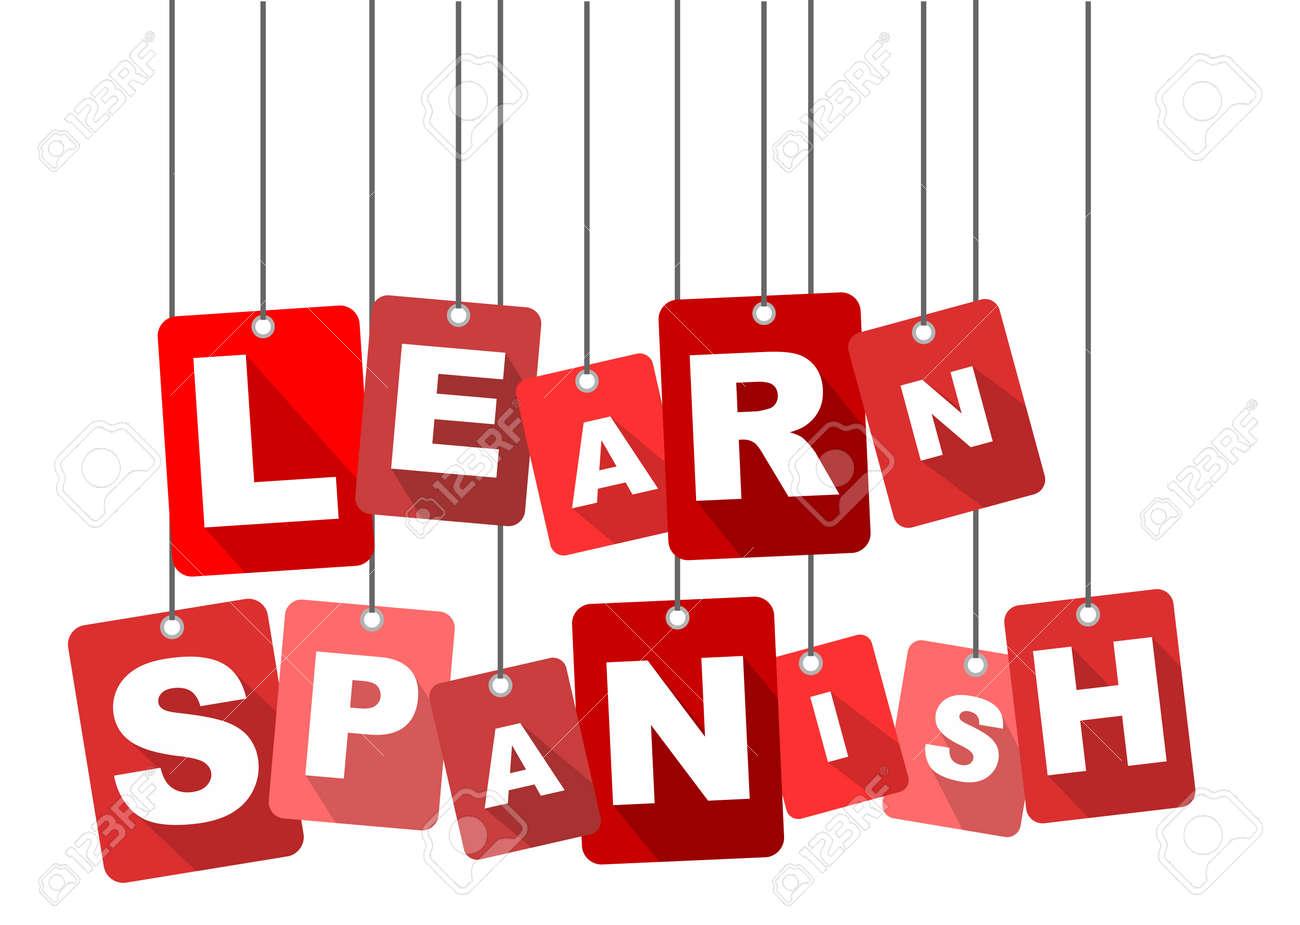 Learn spanish red vector learn spanish flat vector learn spanish learn spanish red vector learn spanish flat vector learn spanish background learn spanish voltagebd Gallery